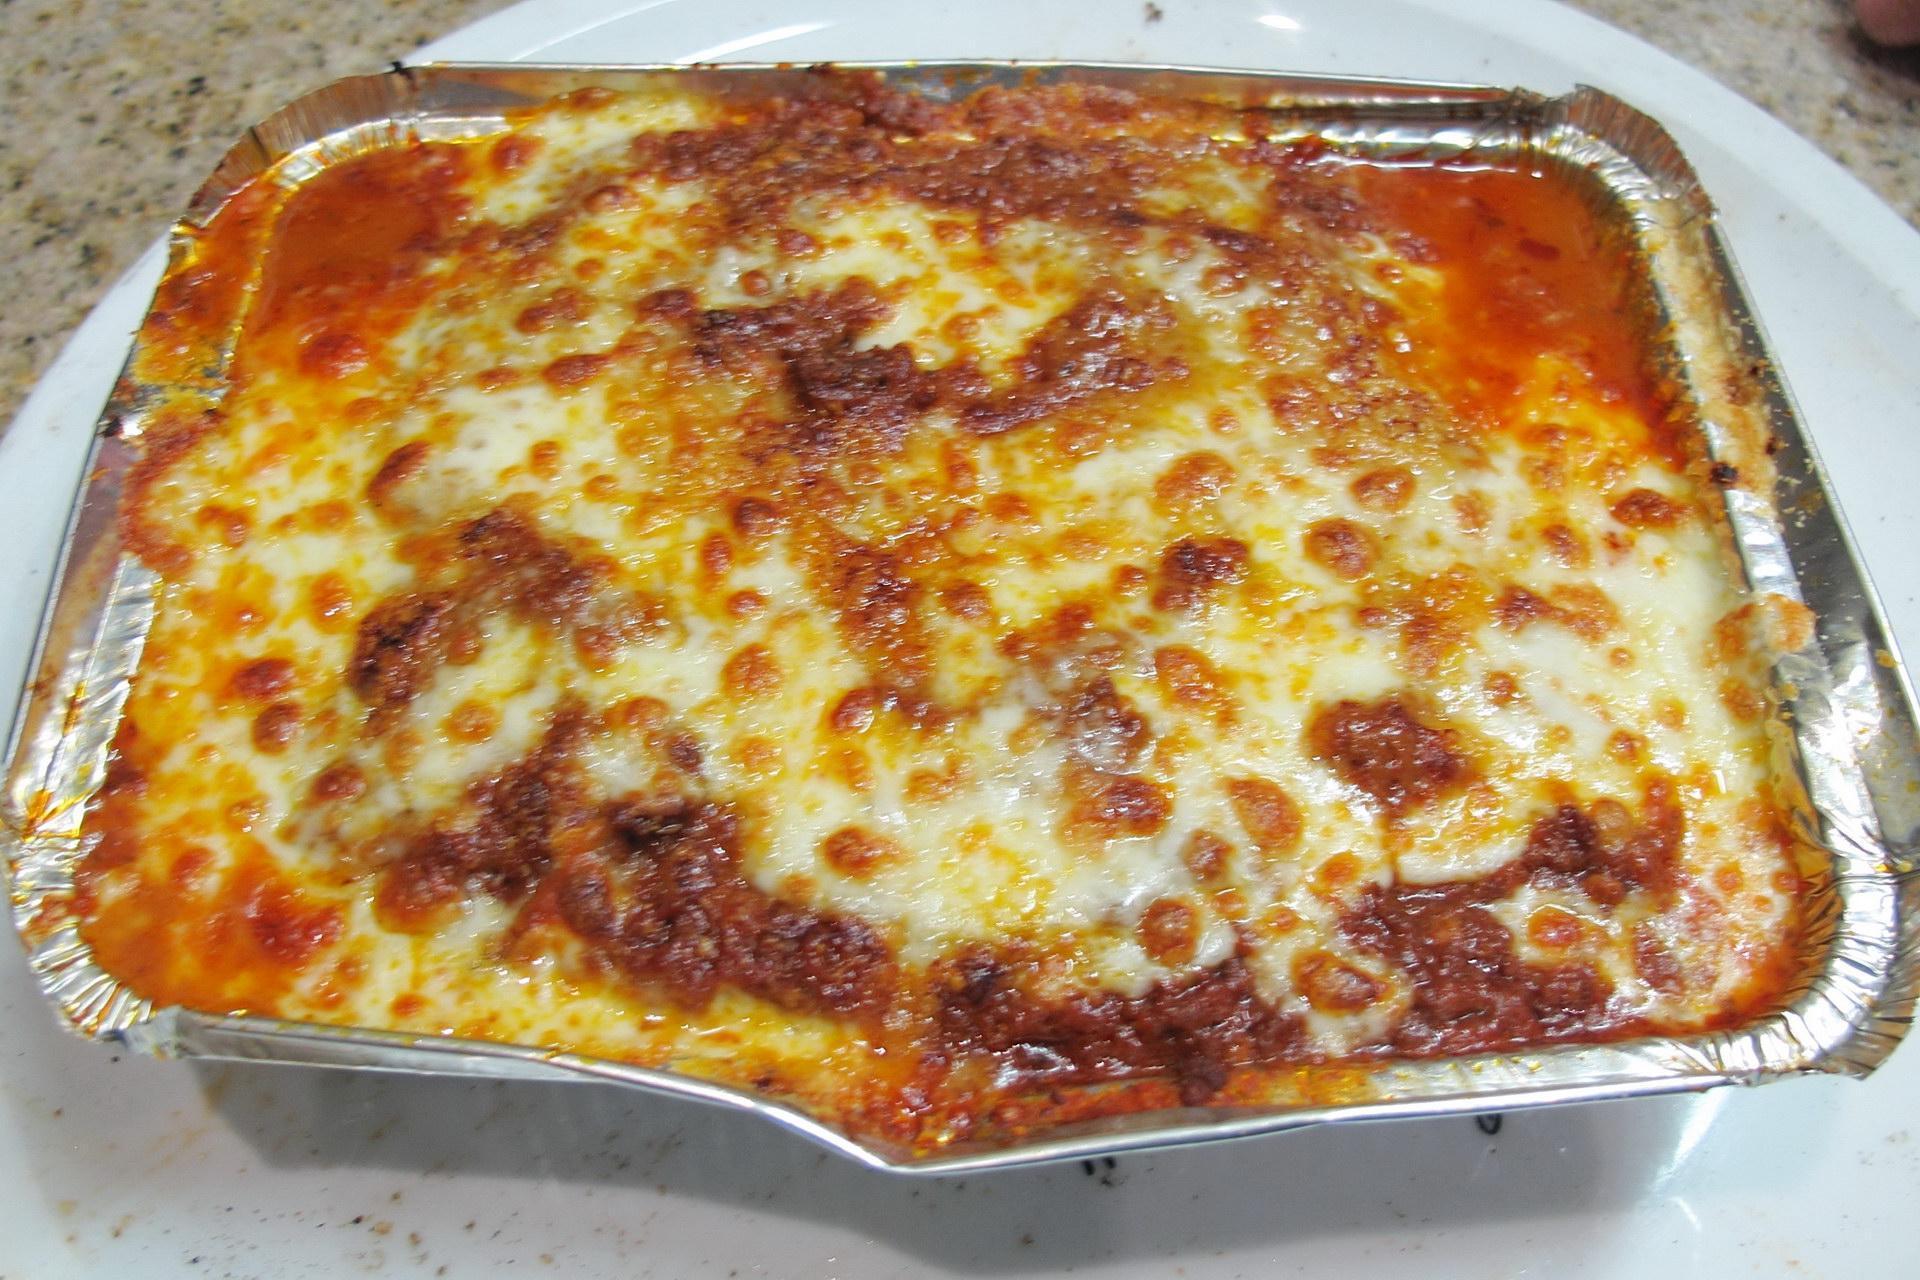 Le-Mediterraneen-Pizza-Braine-l-Alleud-0028.jpg